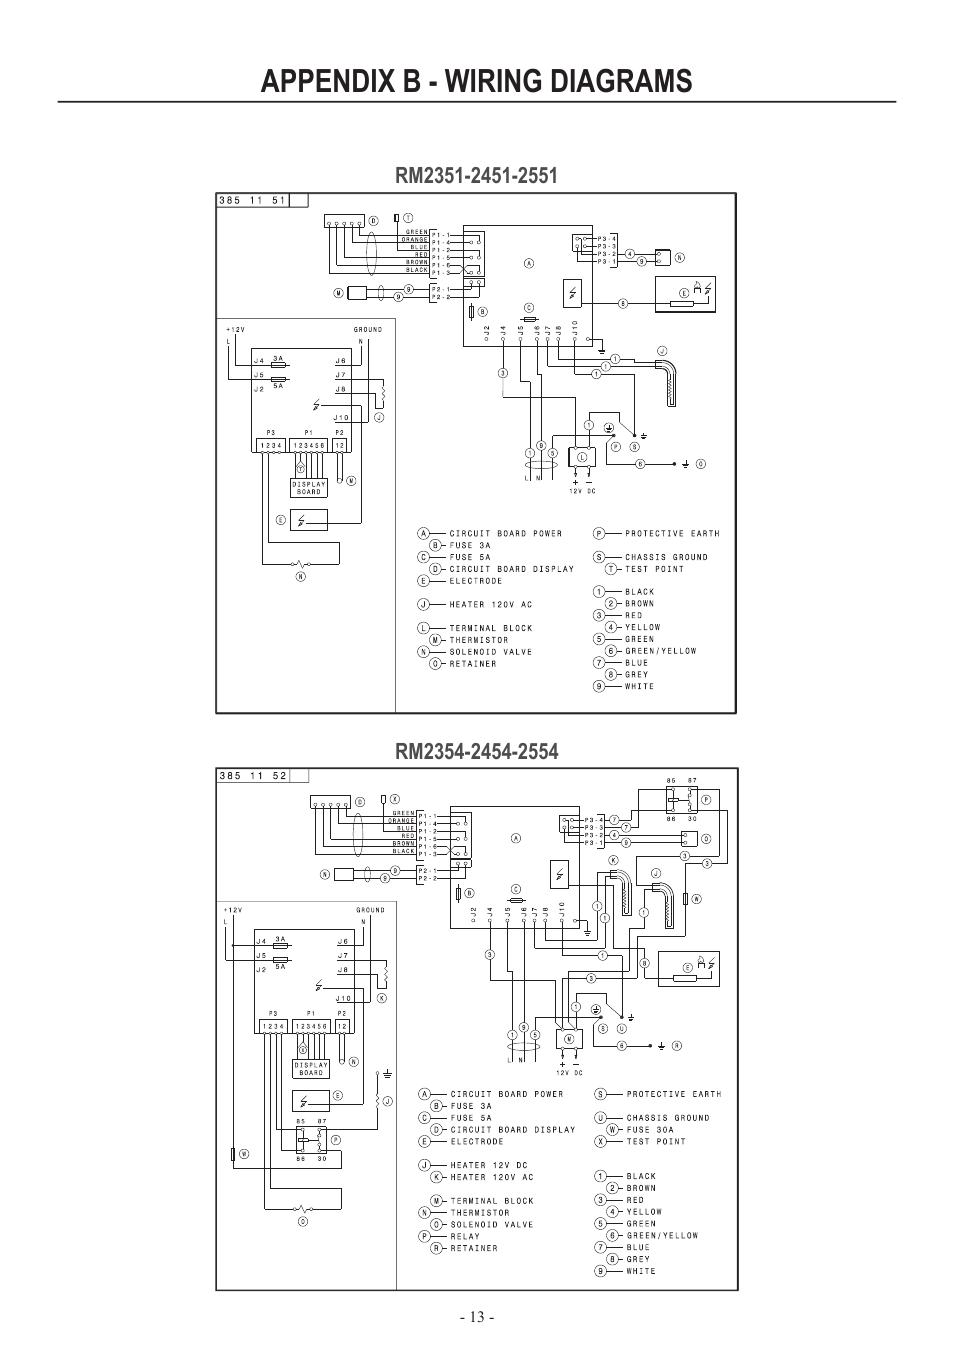 dometic rm2852 wiring diagram 2004 hyundai santa fe car stereo radio appendix b diagrams user manual page 13 16